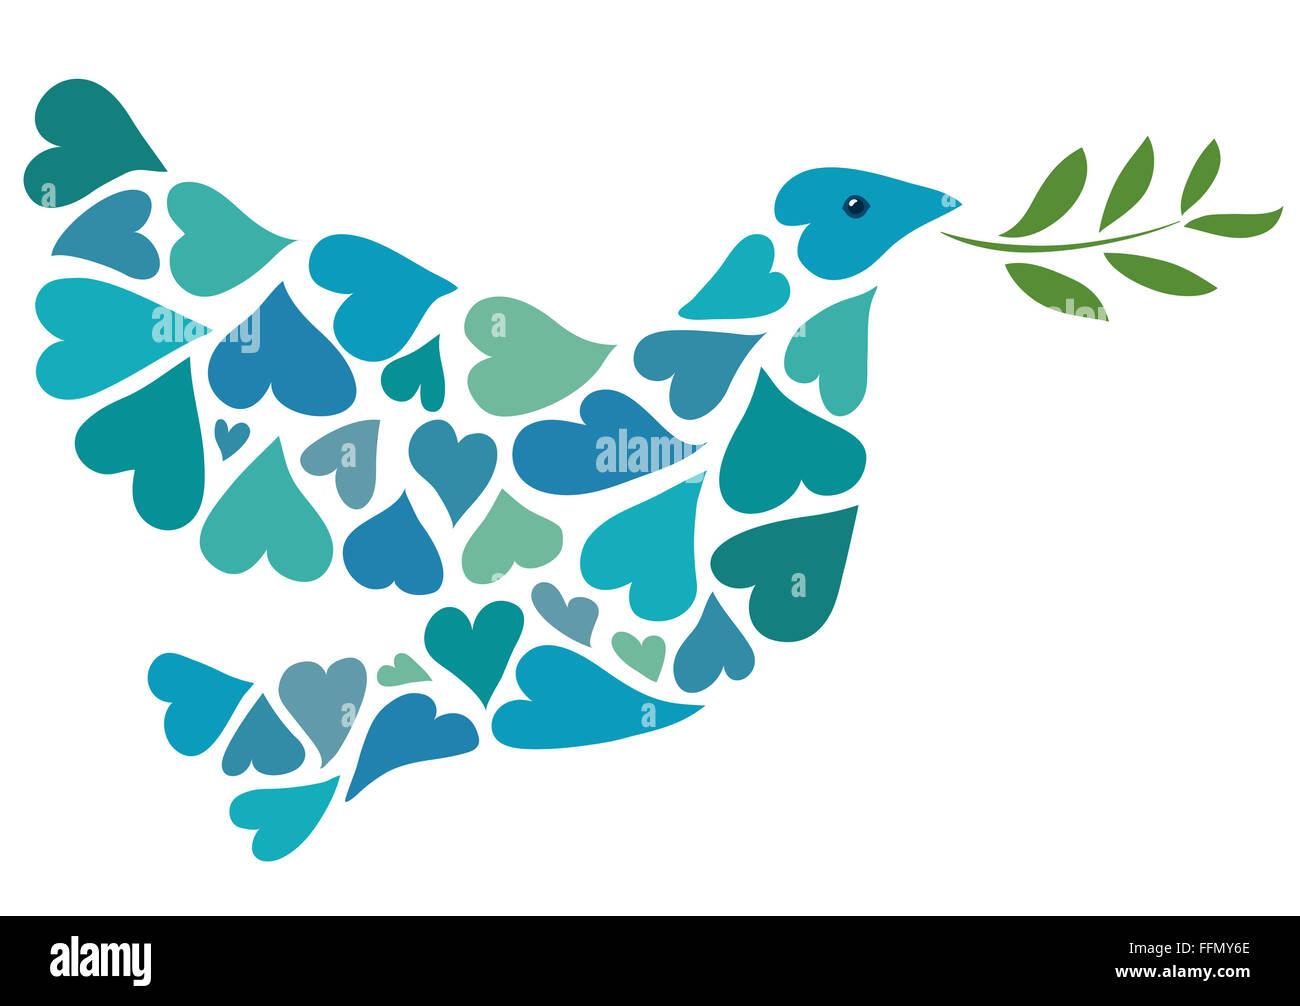 Peace dove of hearts - Stock Image